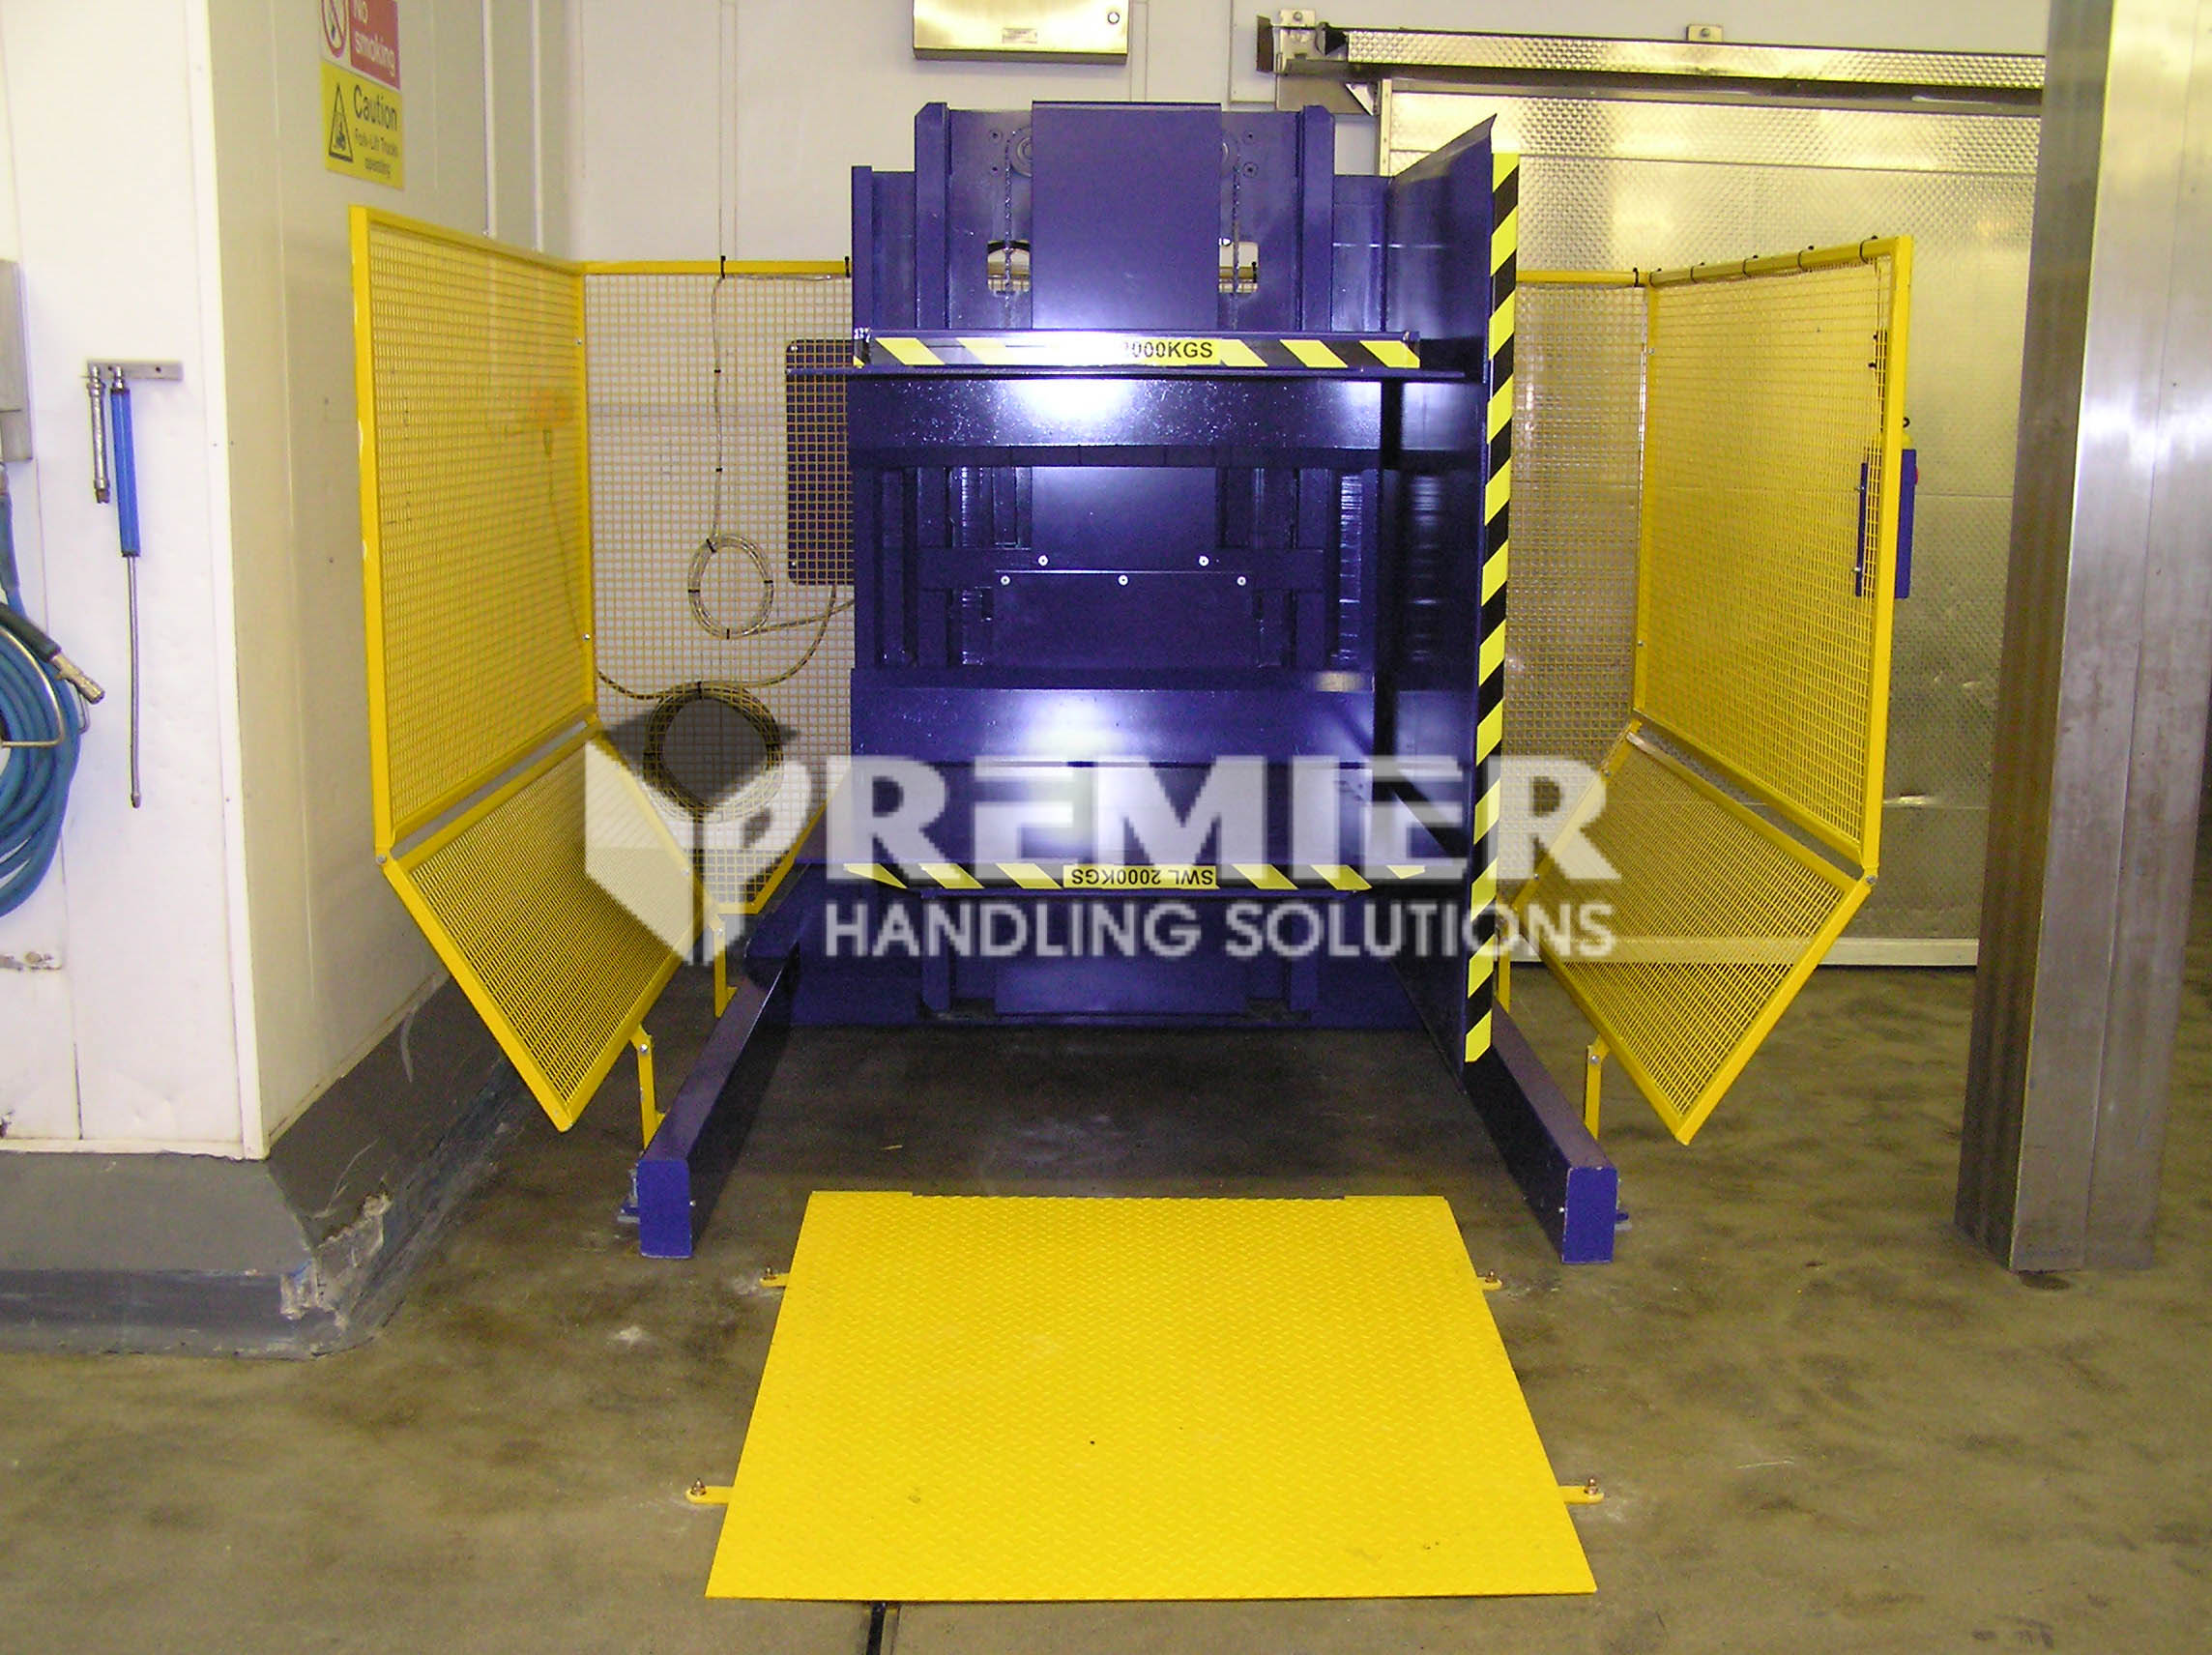 Fsdc Pallet Inverter Gallery 18